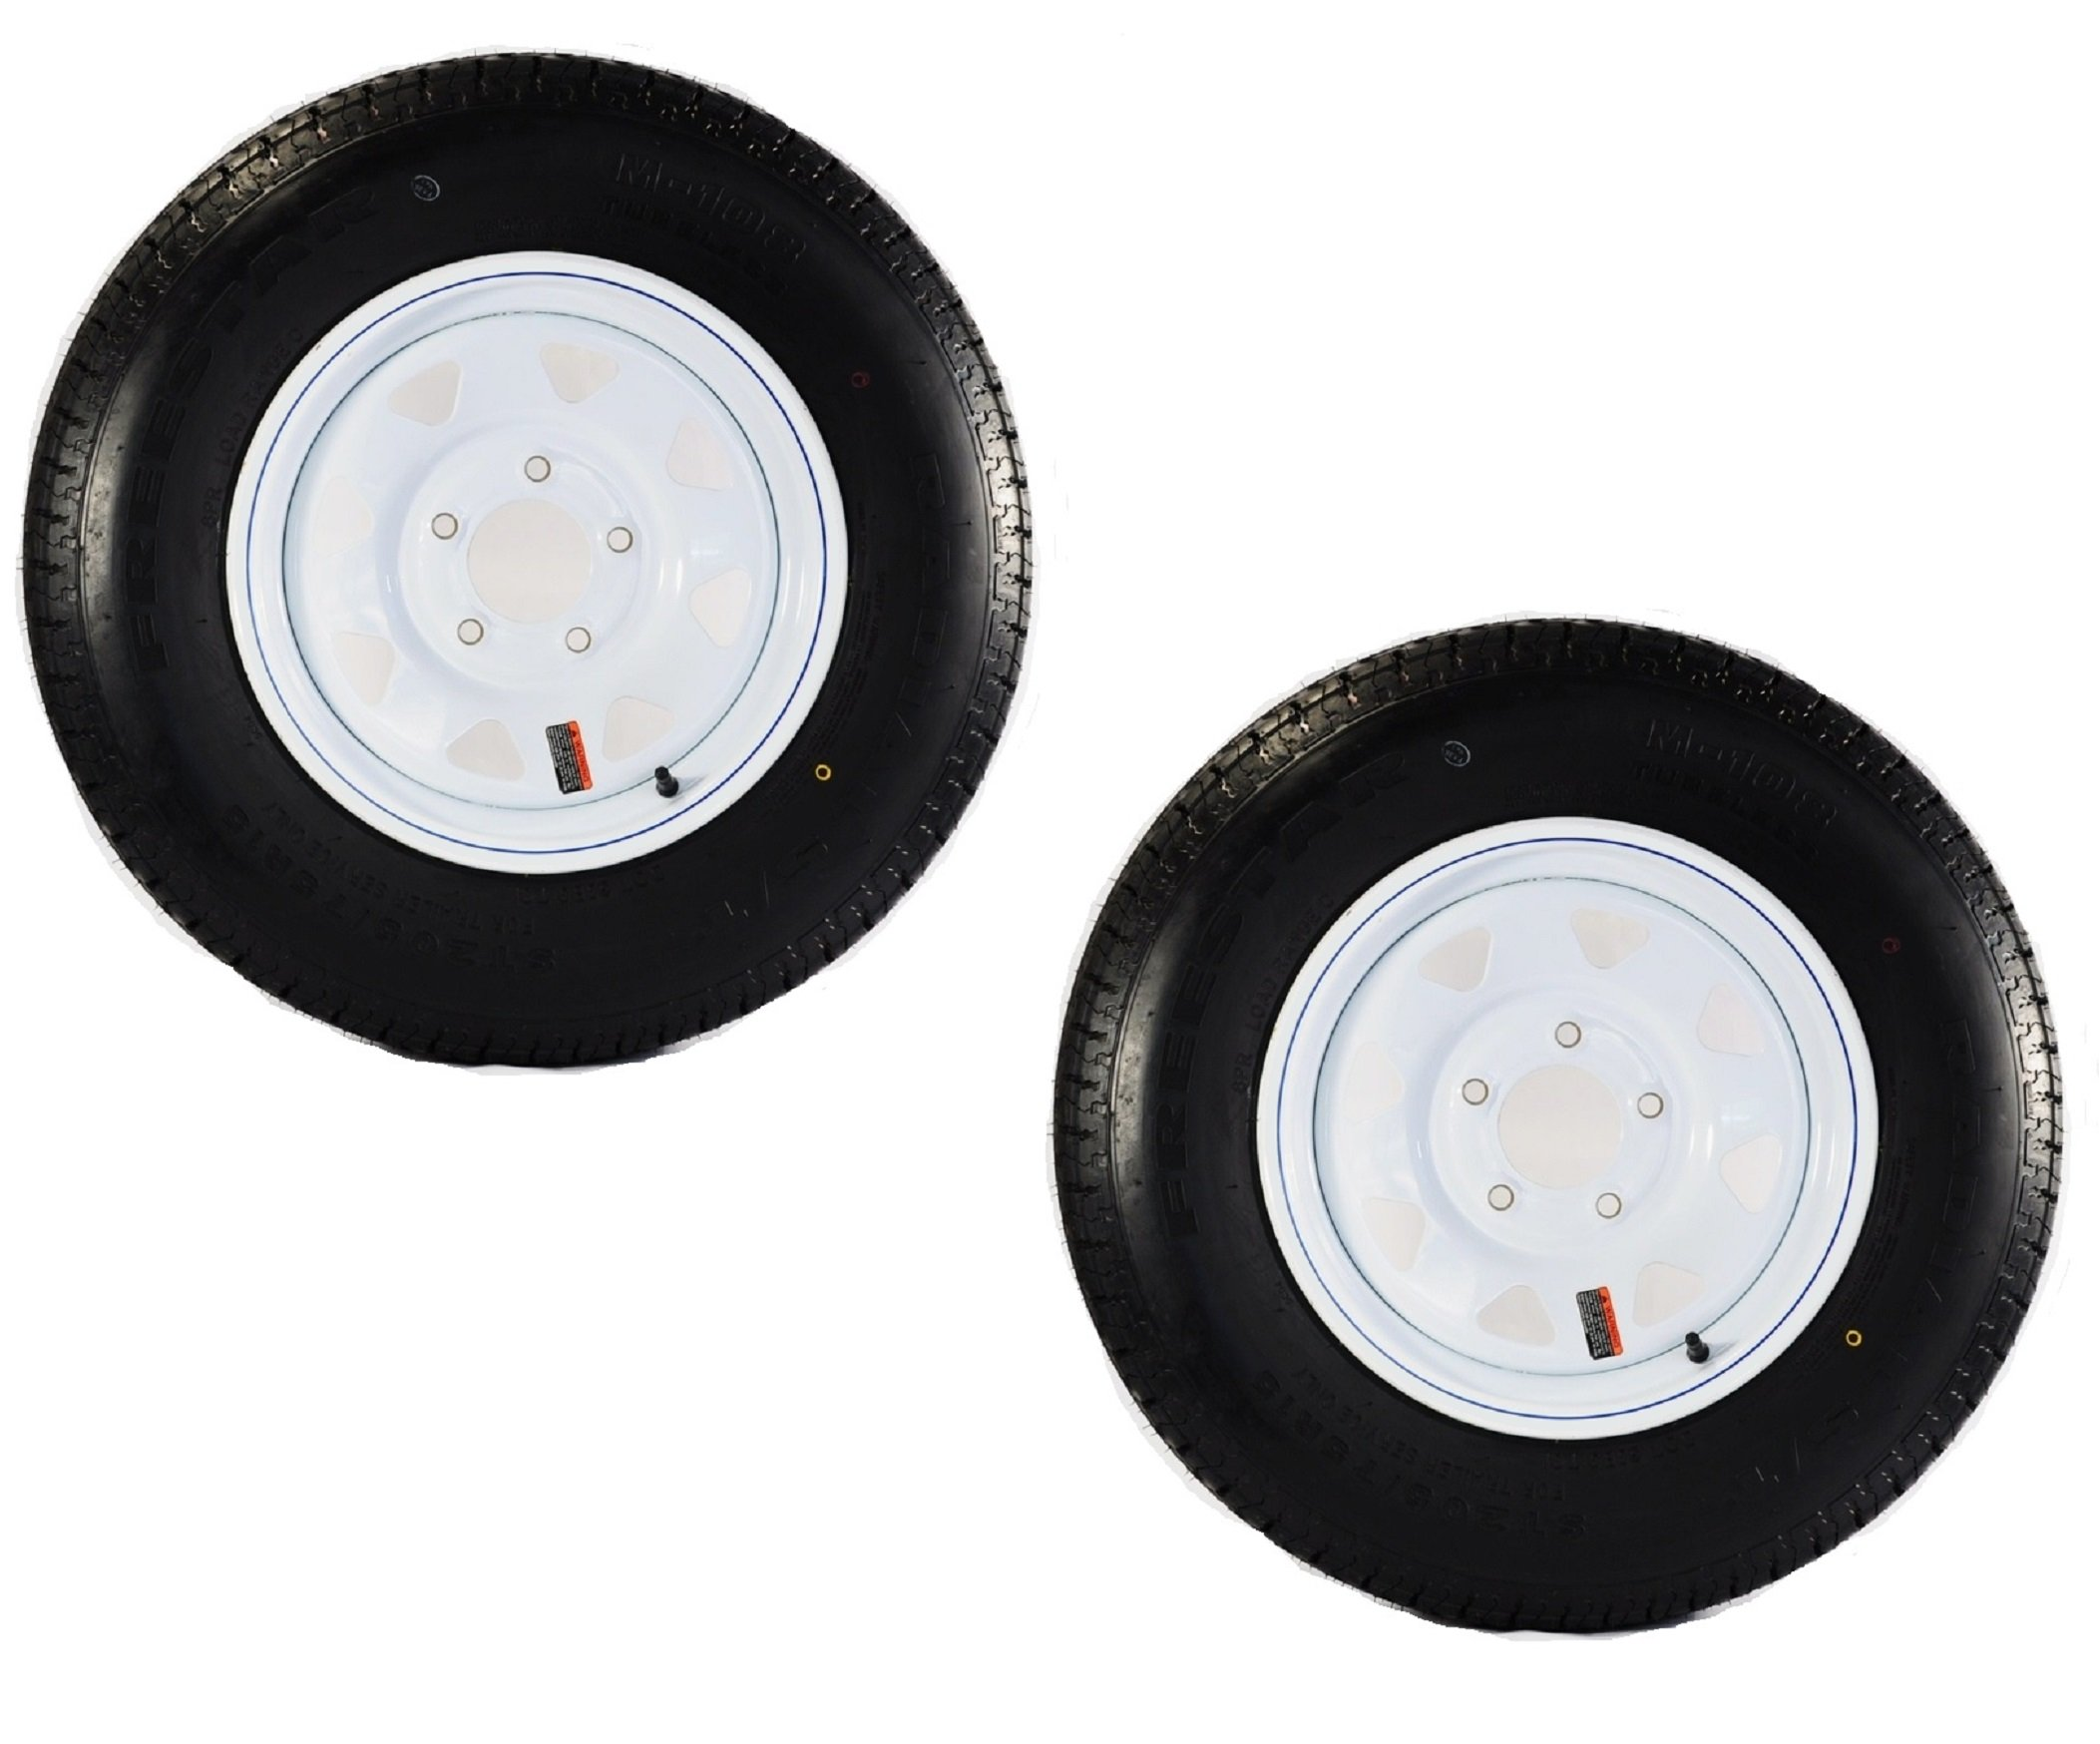 Two Trailer Tires + Rims ST185/80D13 5L 13 ST White Spoke Boat Camper RV